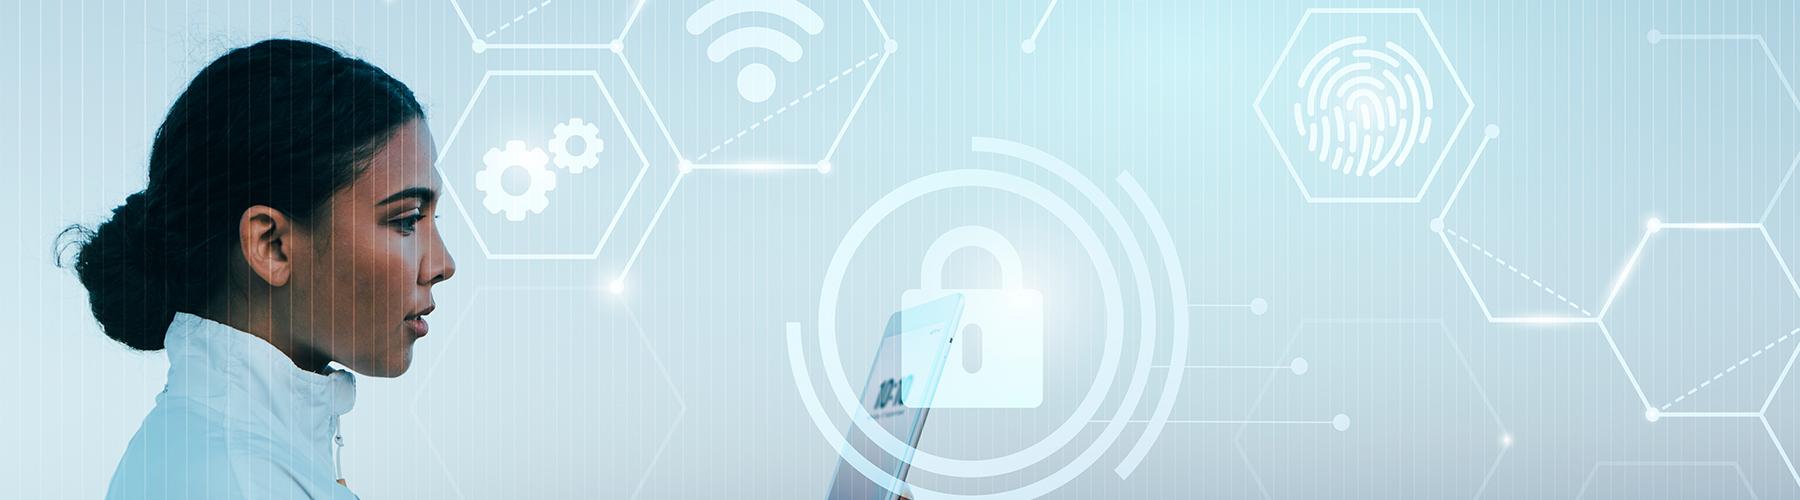 Cybersecurity, IoT blog